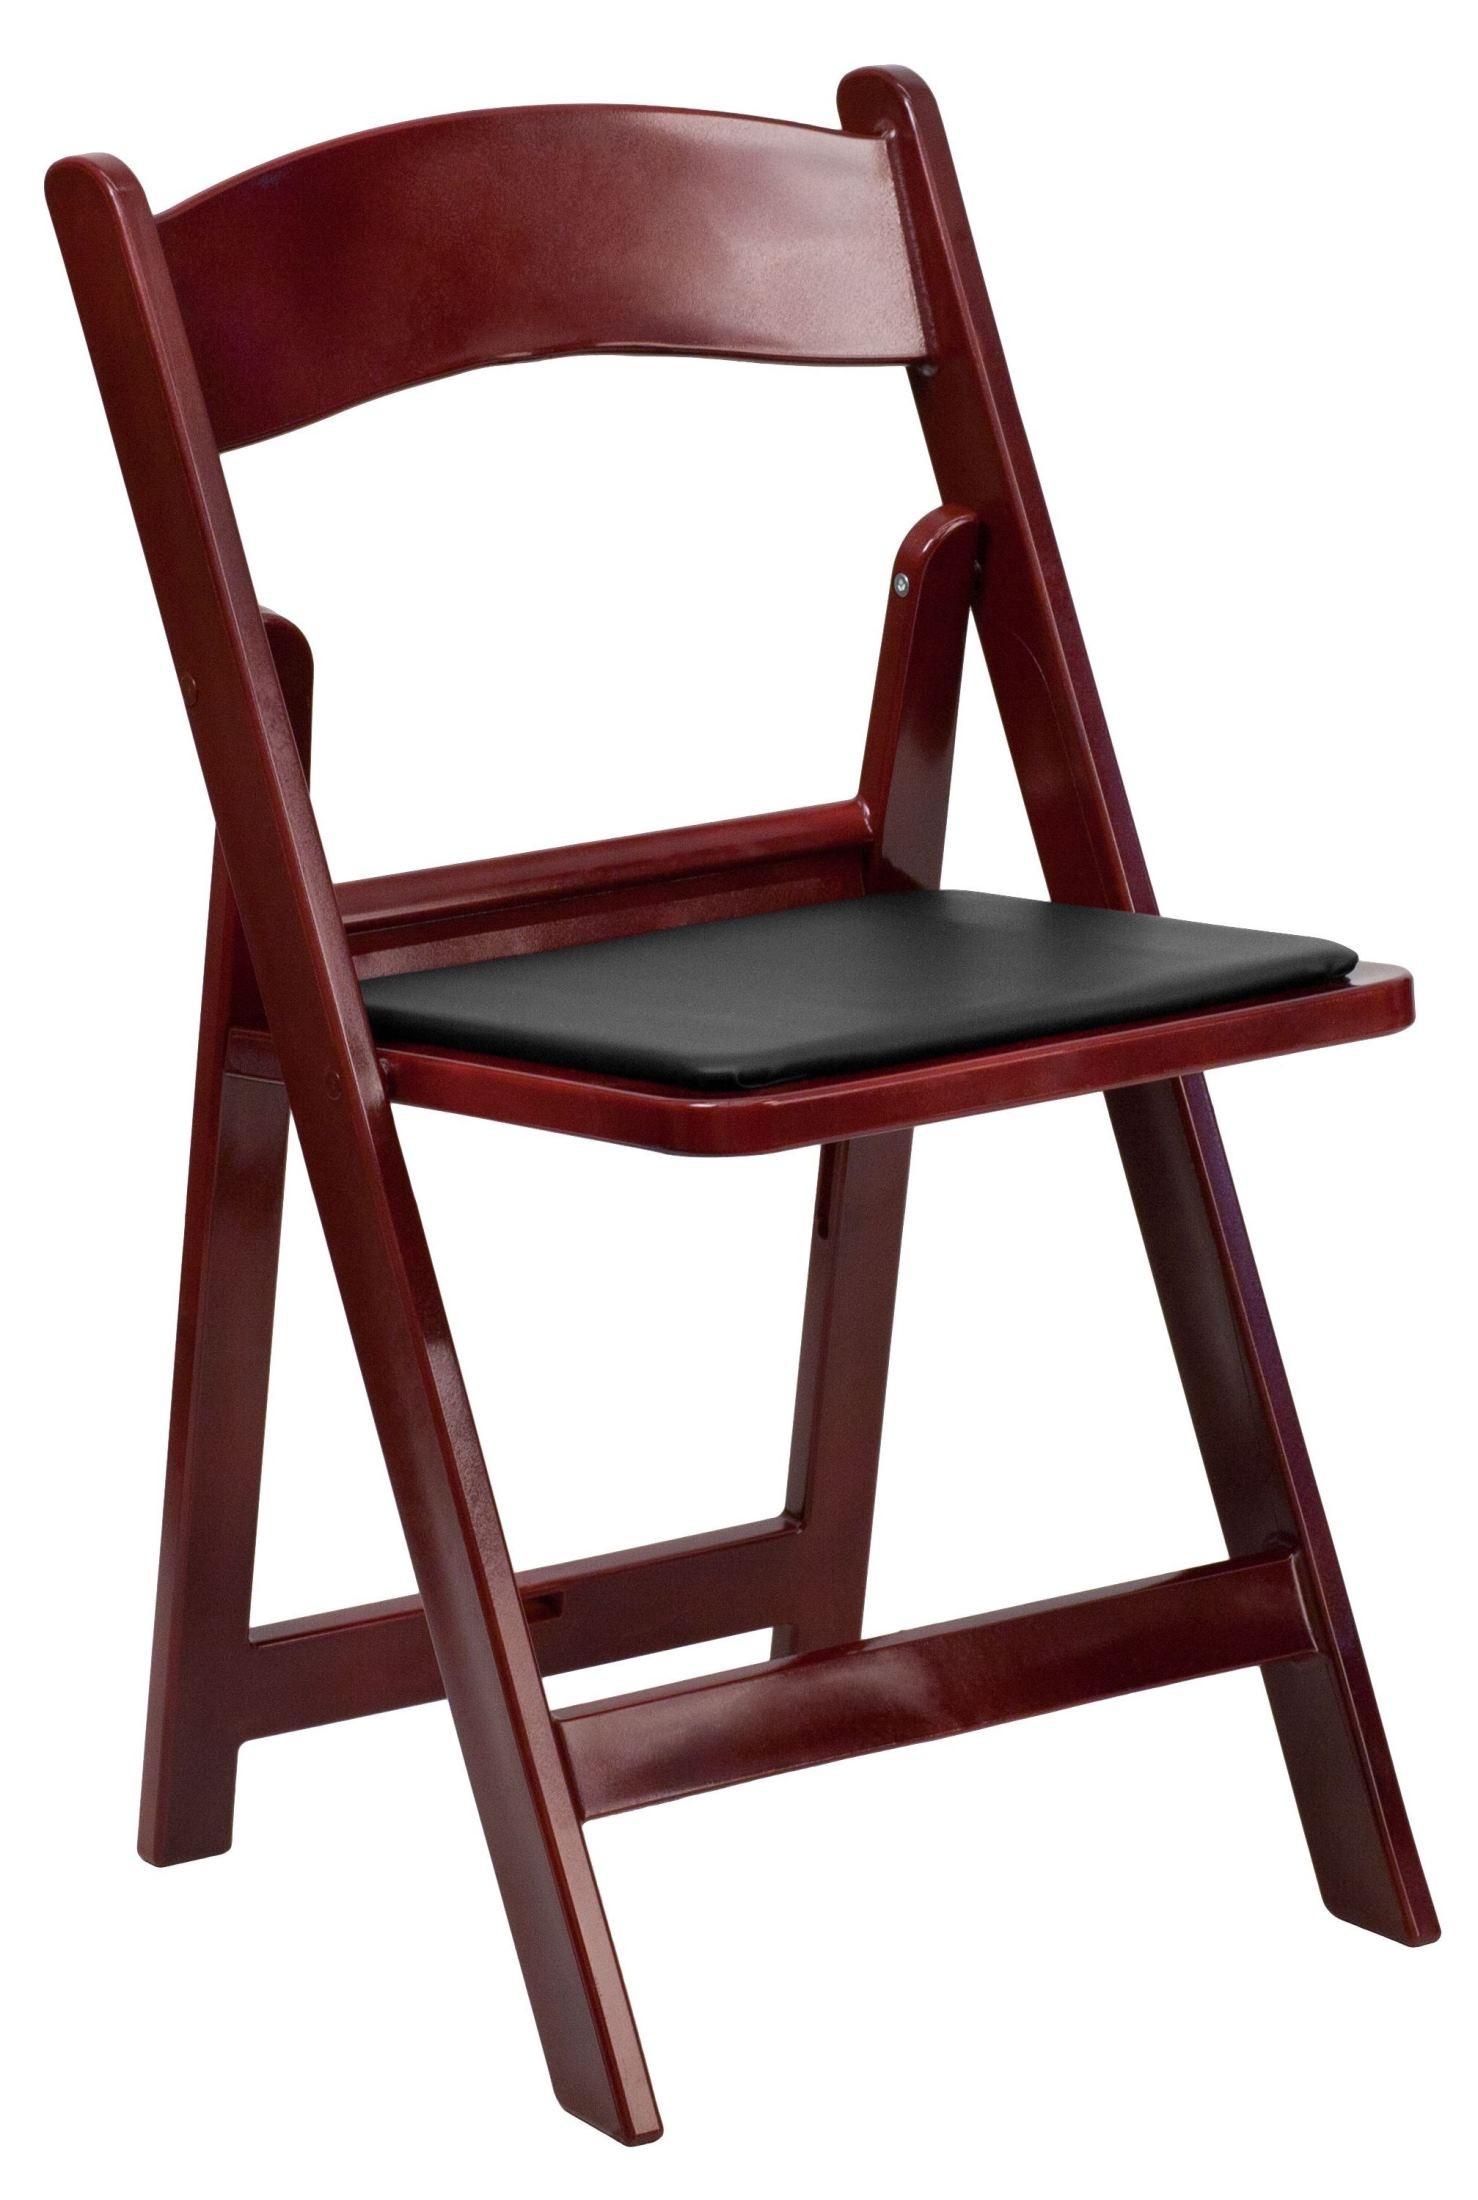 hercules folding chair white office ikea series red mahogany resin vinyl